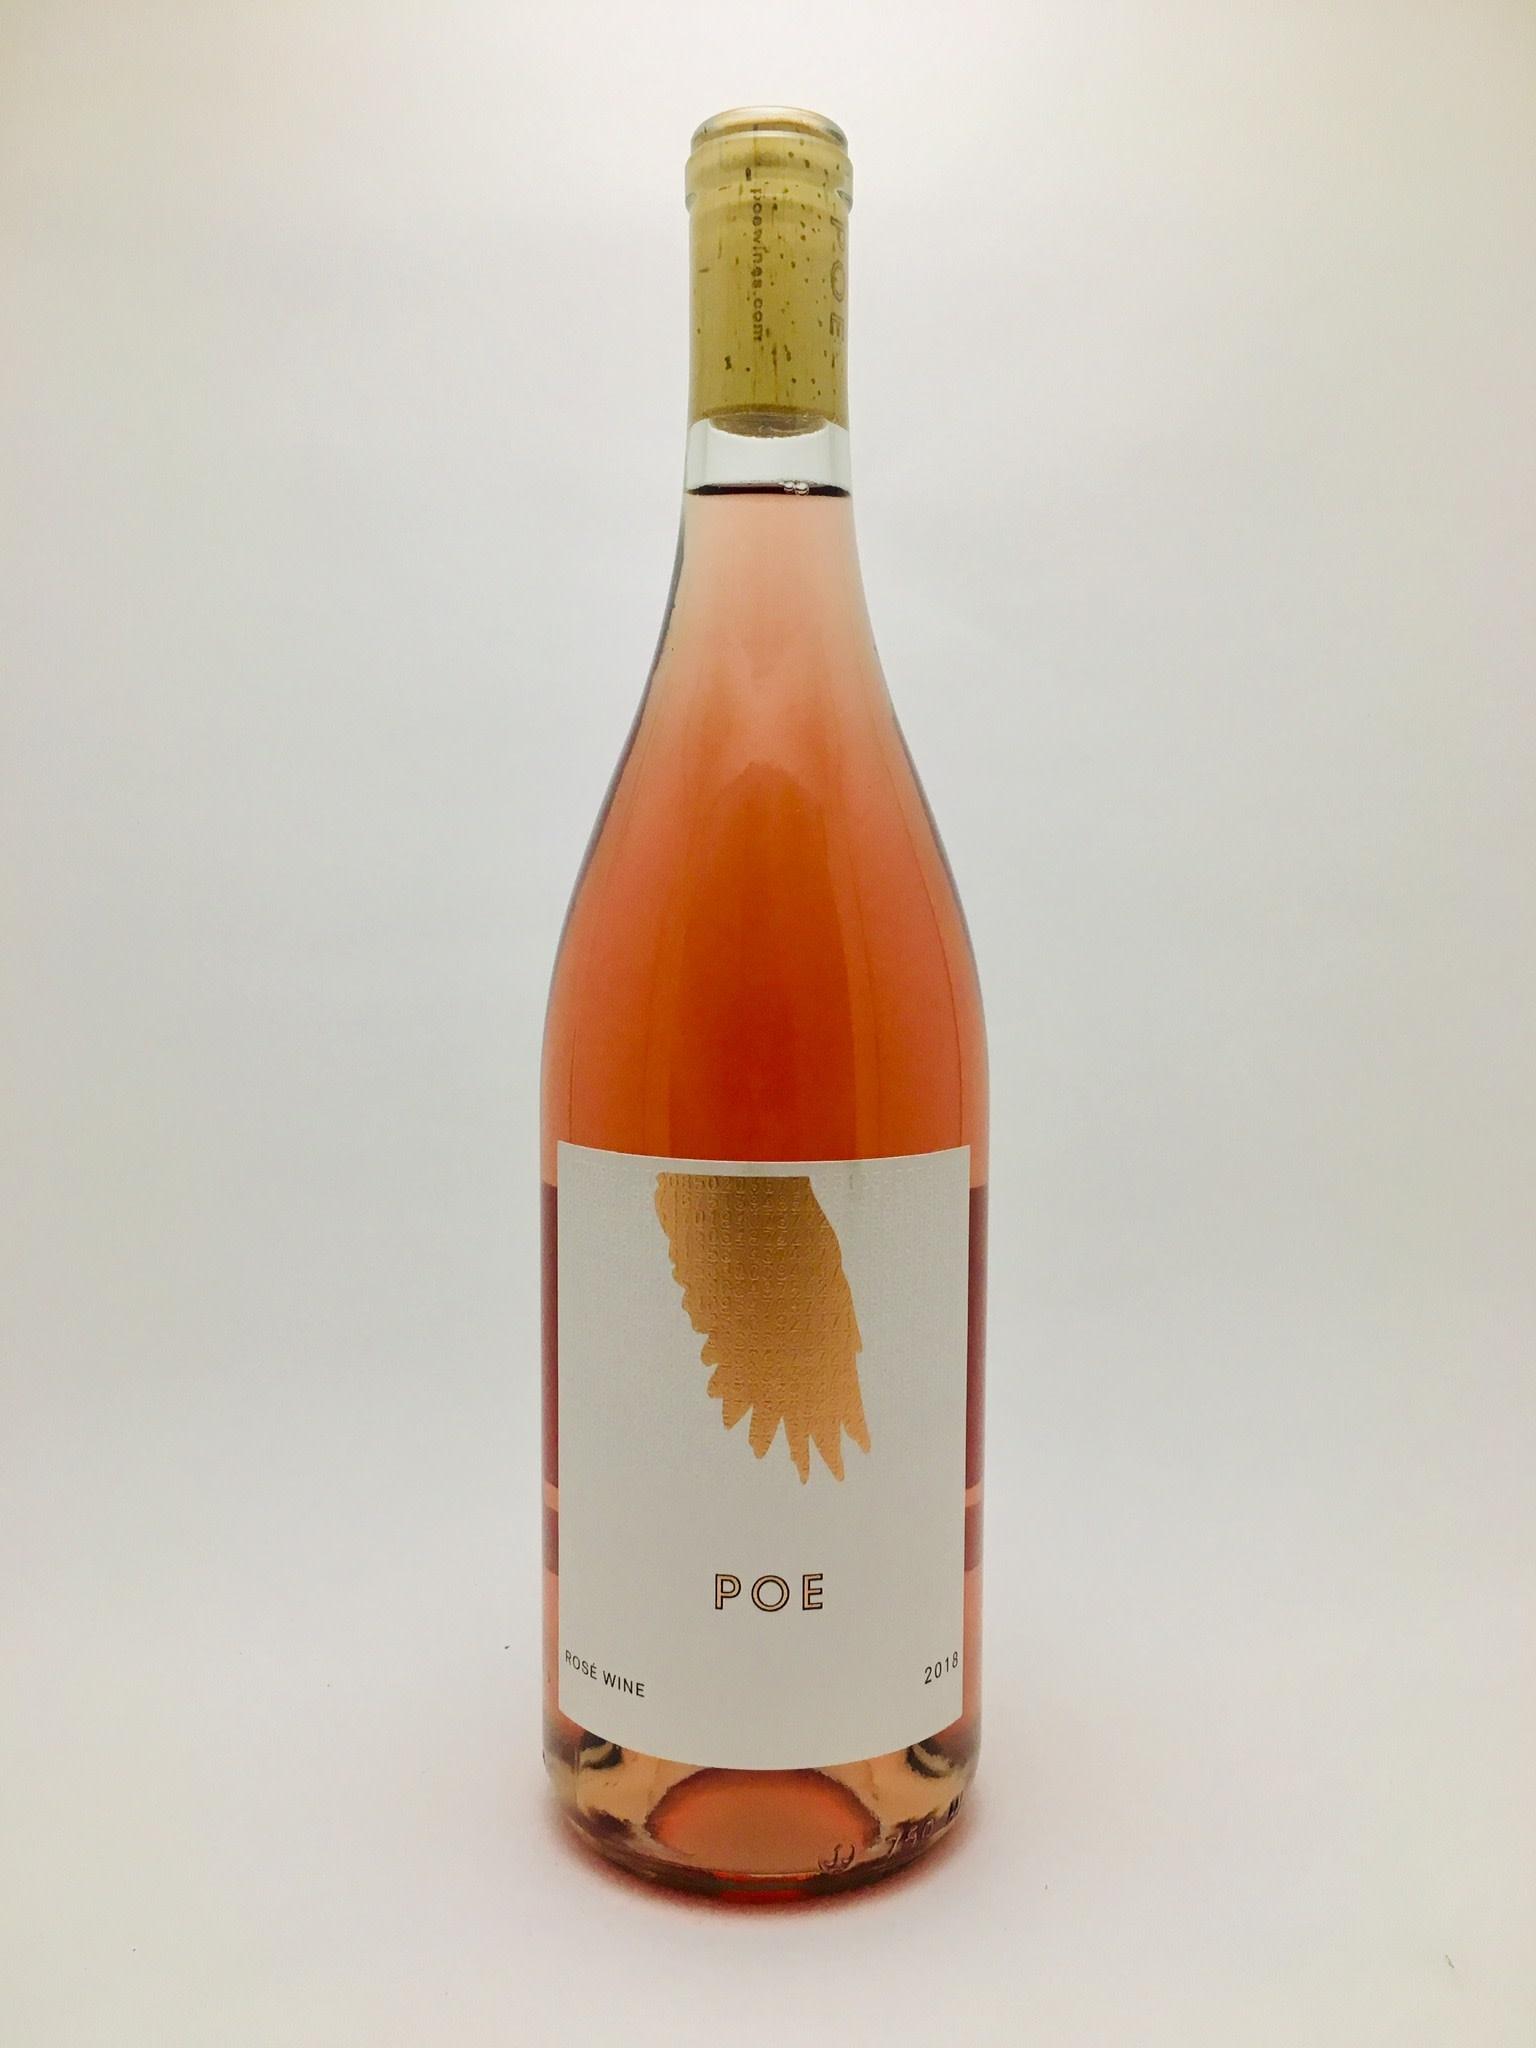 Poe Rosé 2018